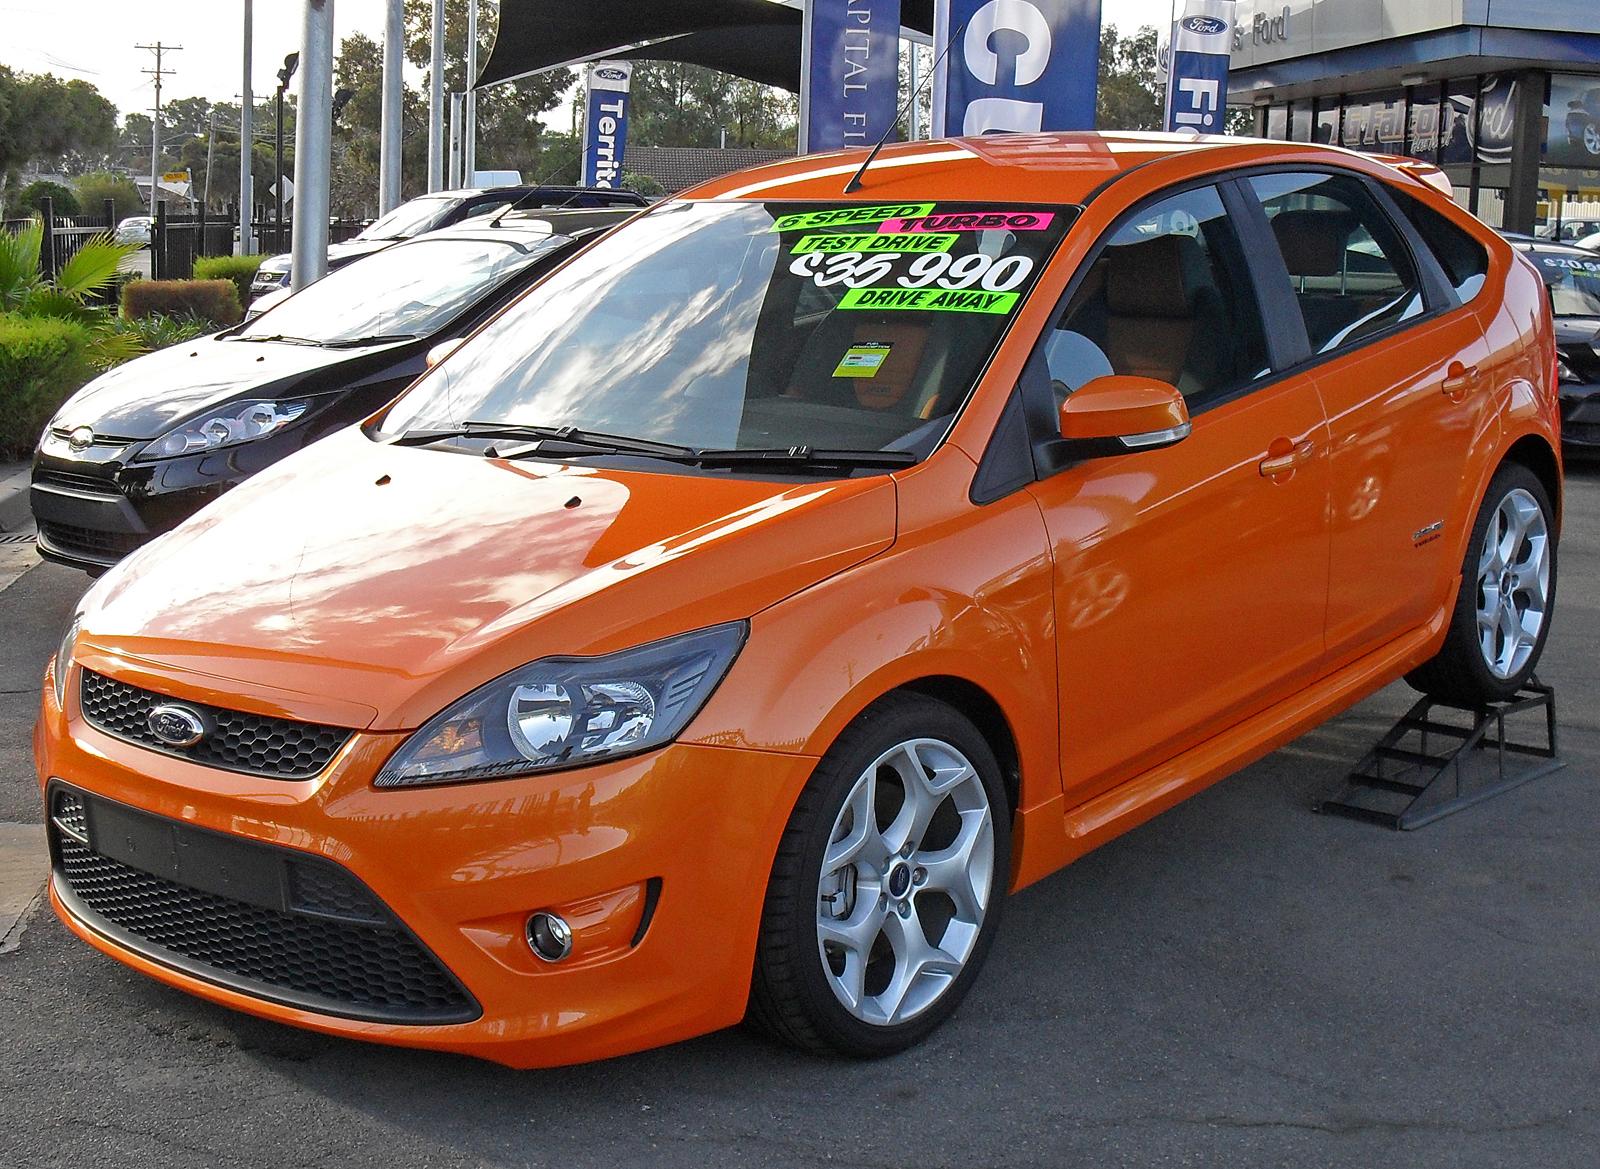 Image Result For Ford Focus Xr Wiki